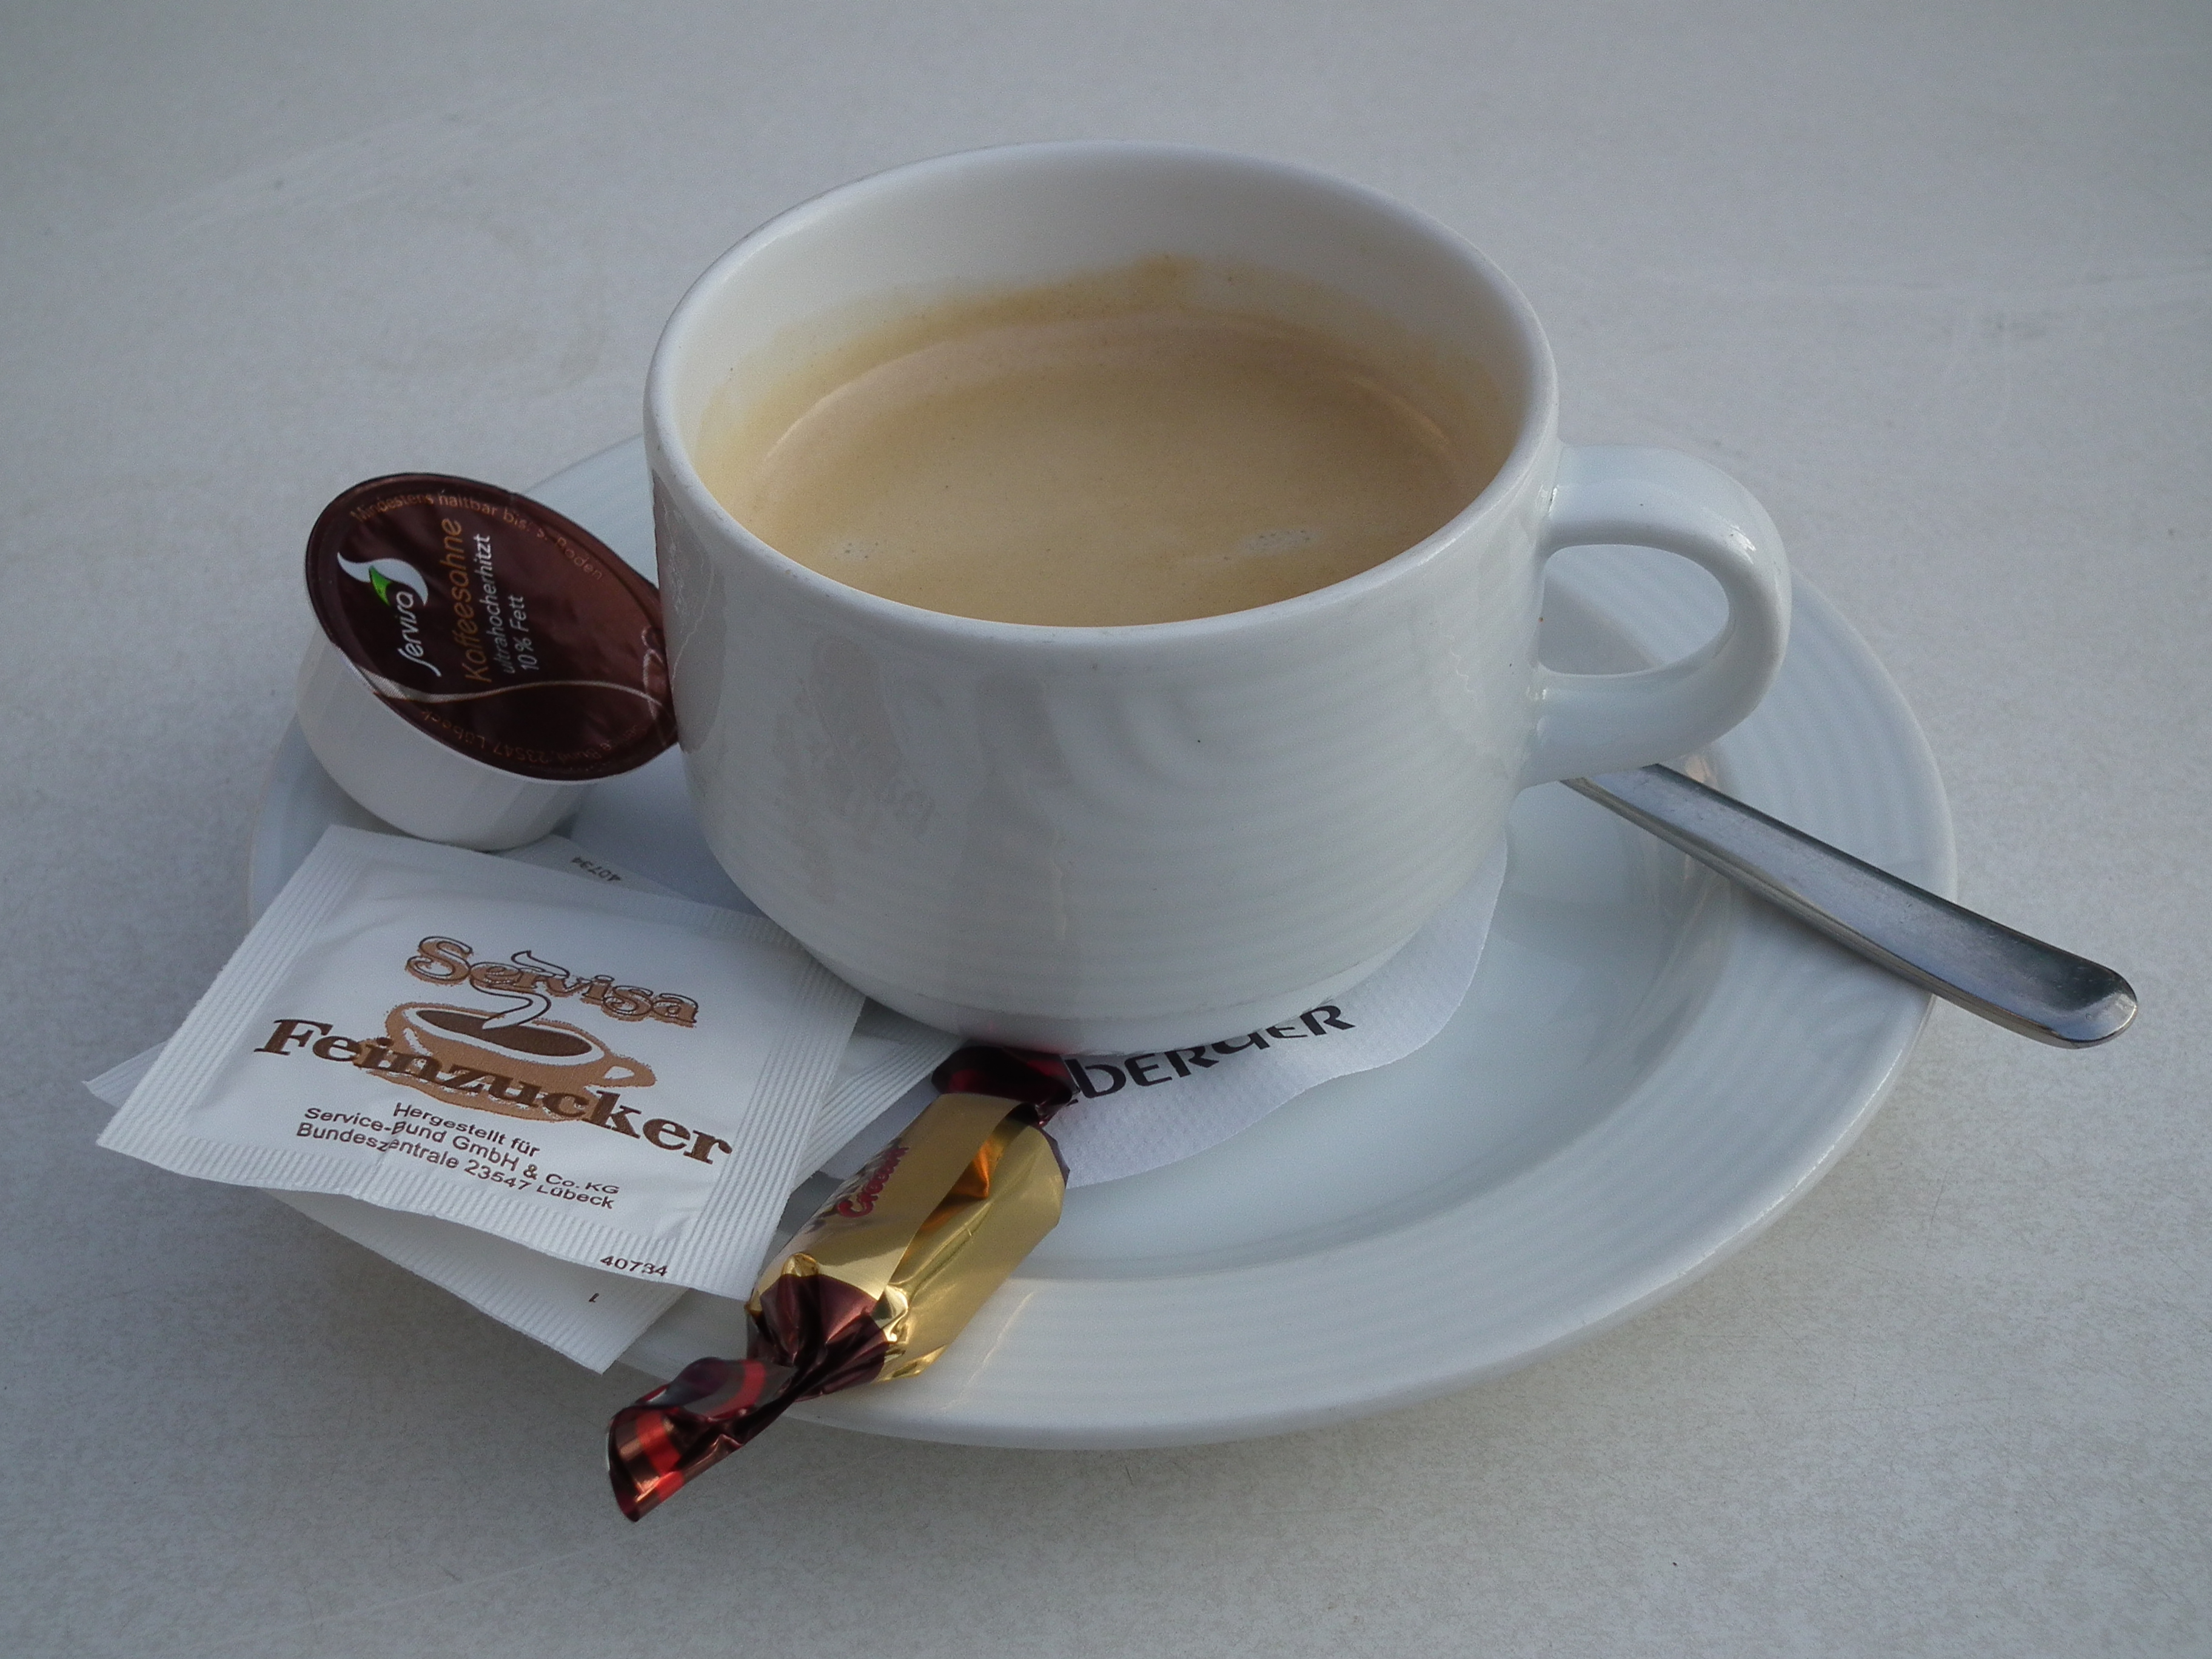 File:Crema Tasse Kaffee.JPG - Wikimedia Commons